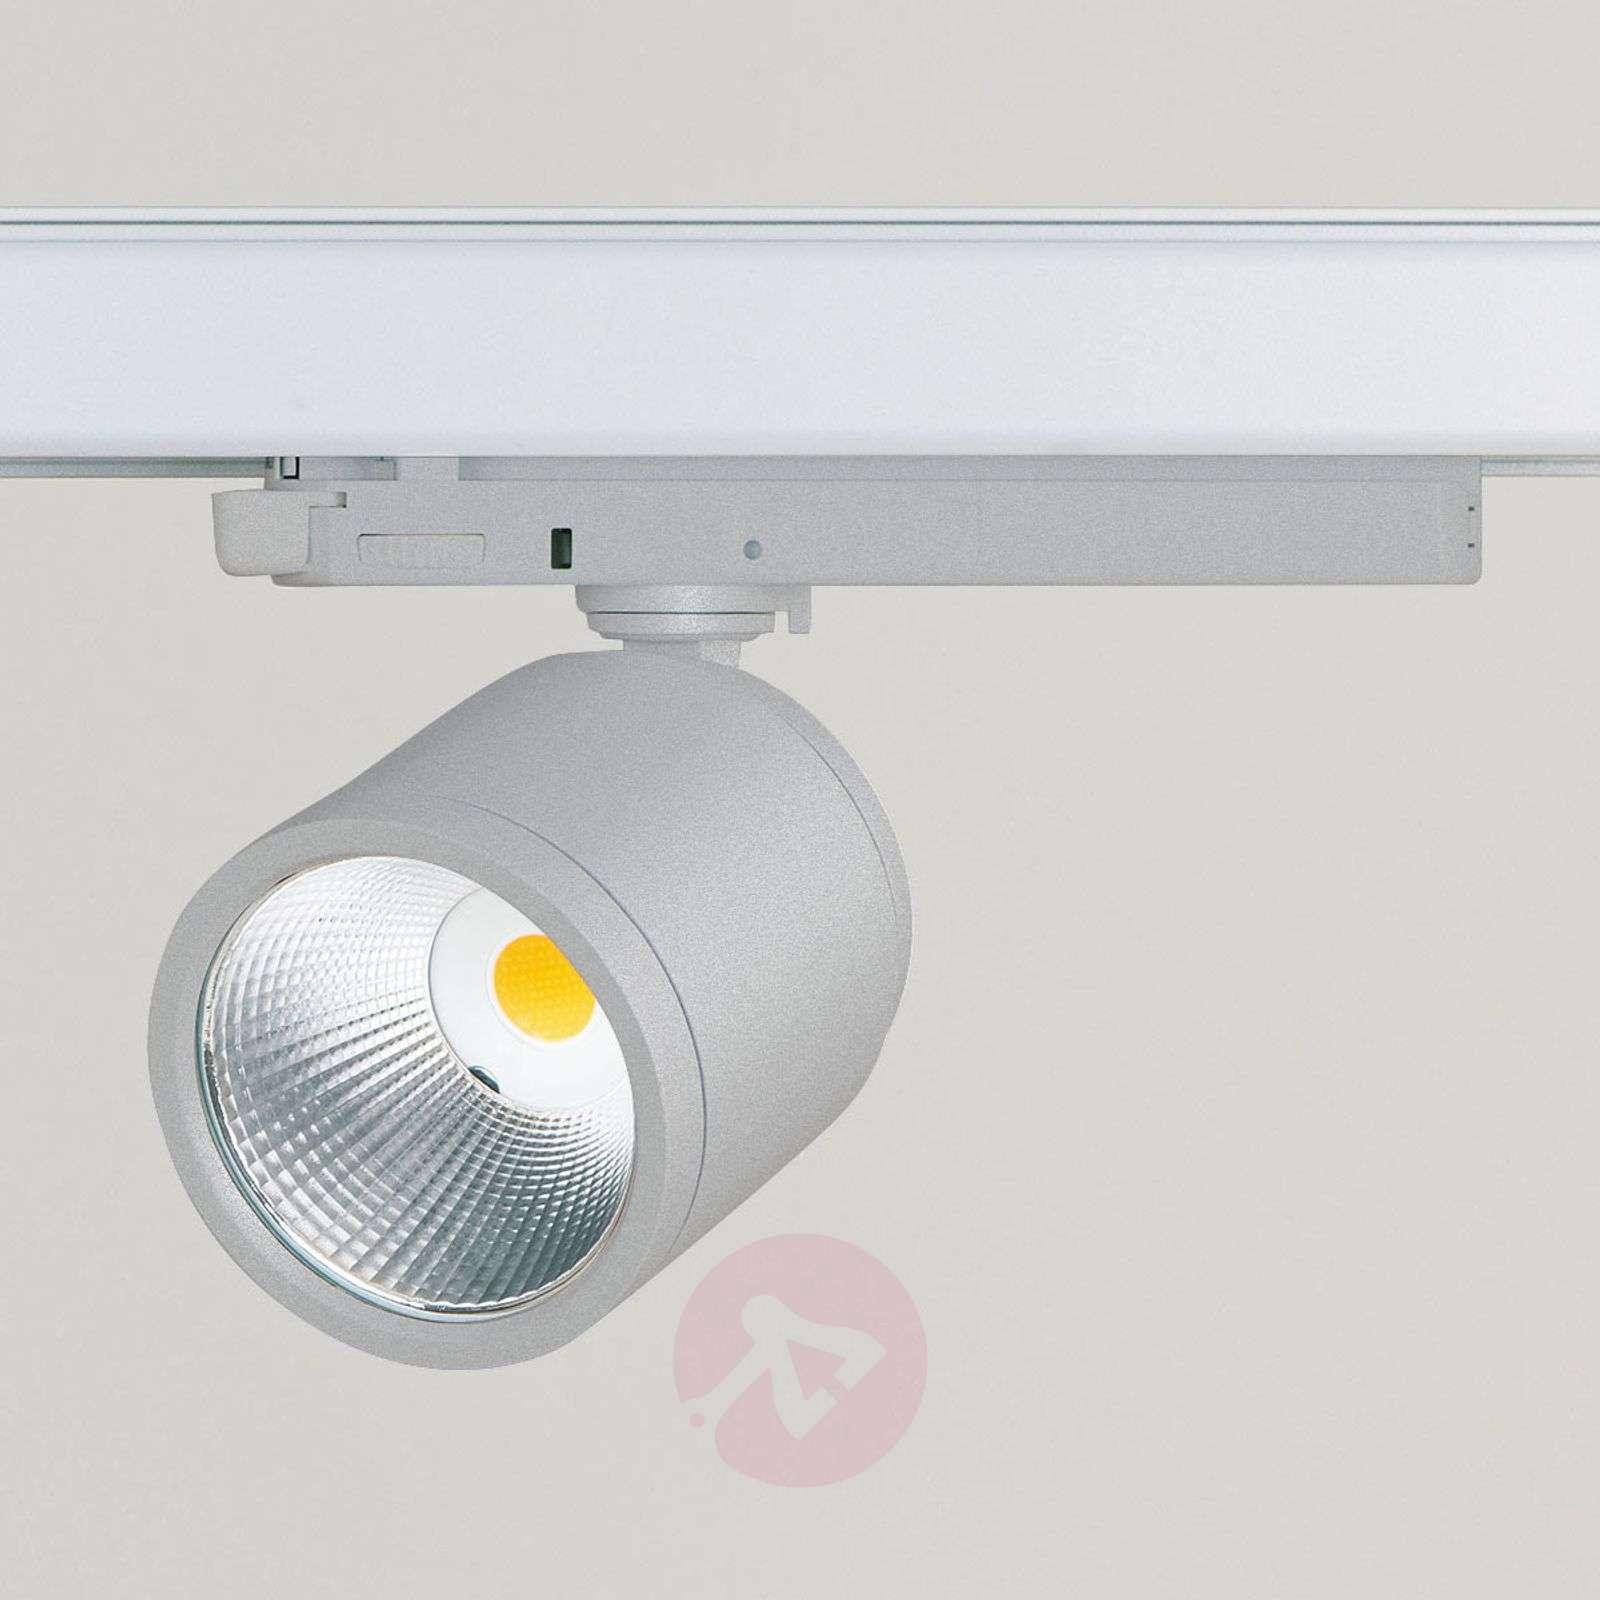 LED-spotti GA 017 Casa, 3-vaihevirtakiskoon, hopea-6523817-01